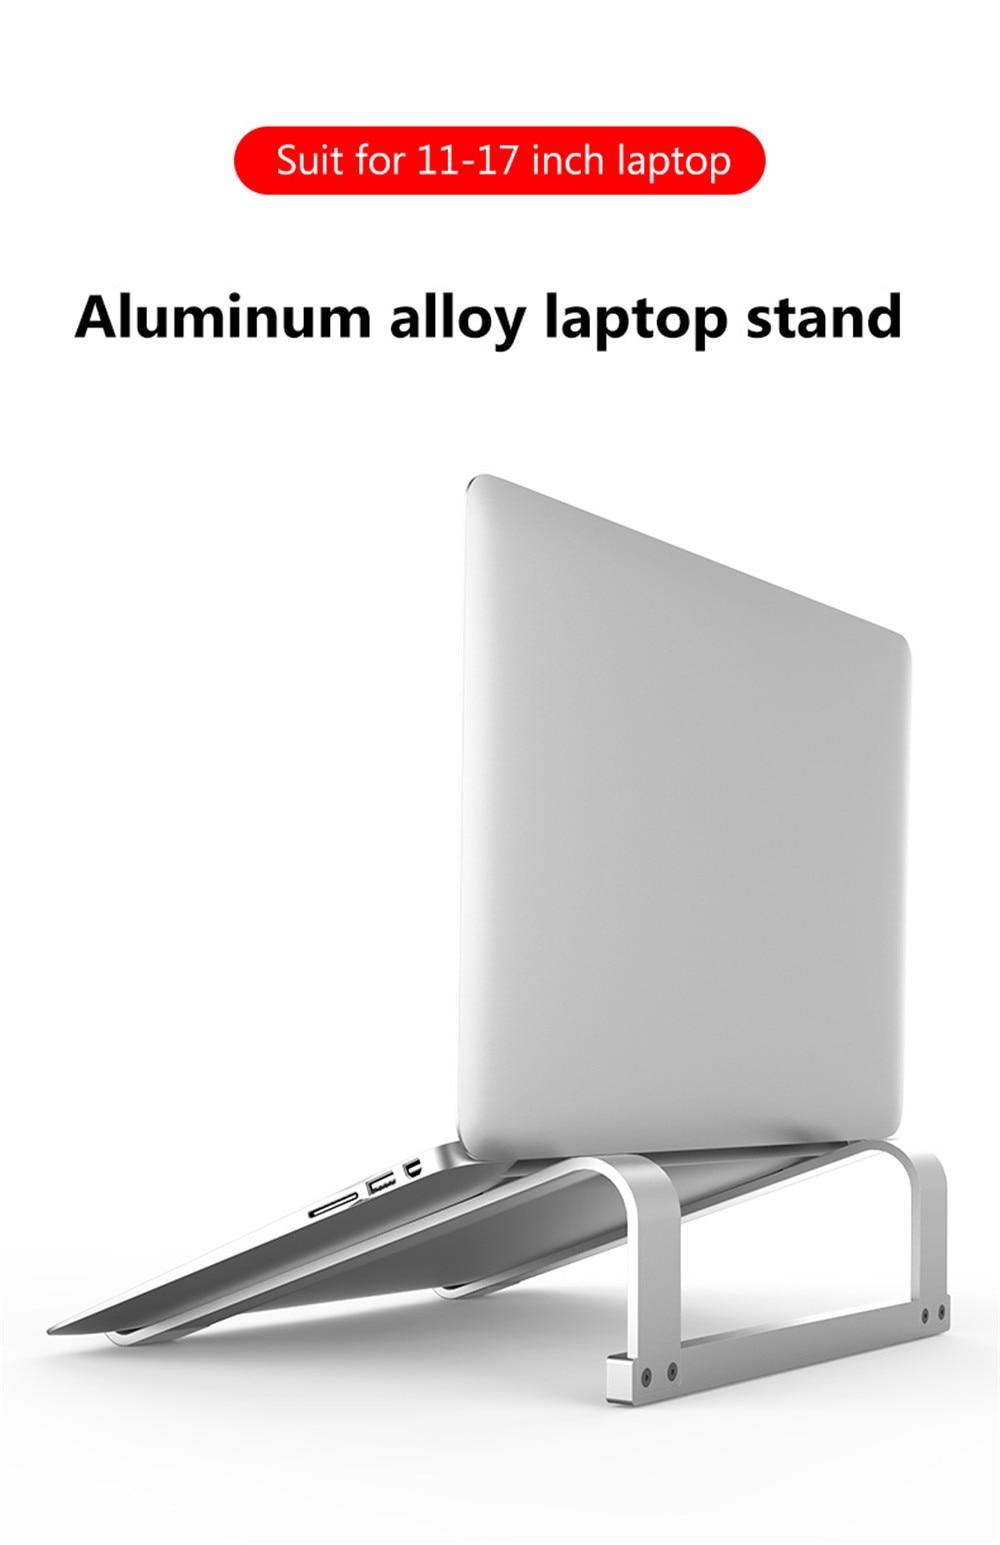 Adjustable Aluminum Laptop Stand Portable Notebook Support Holder